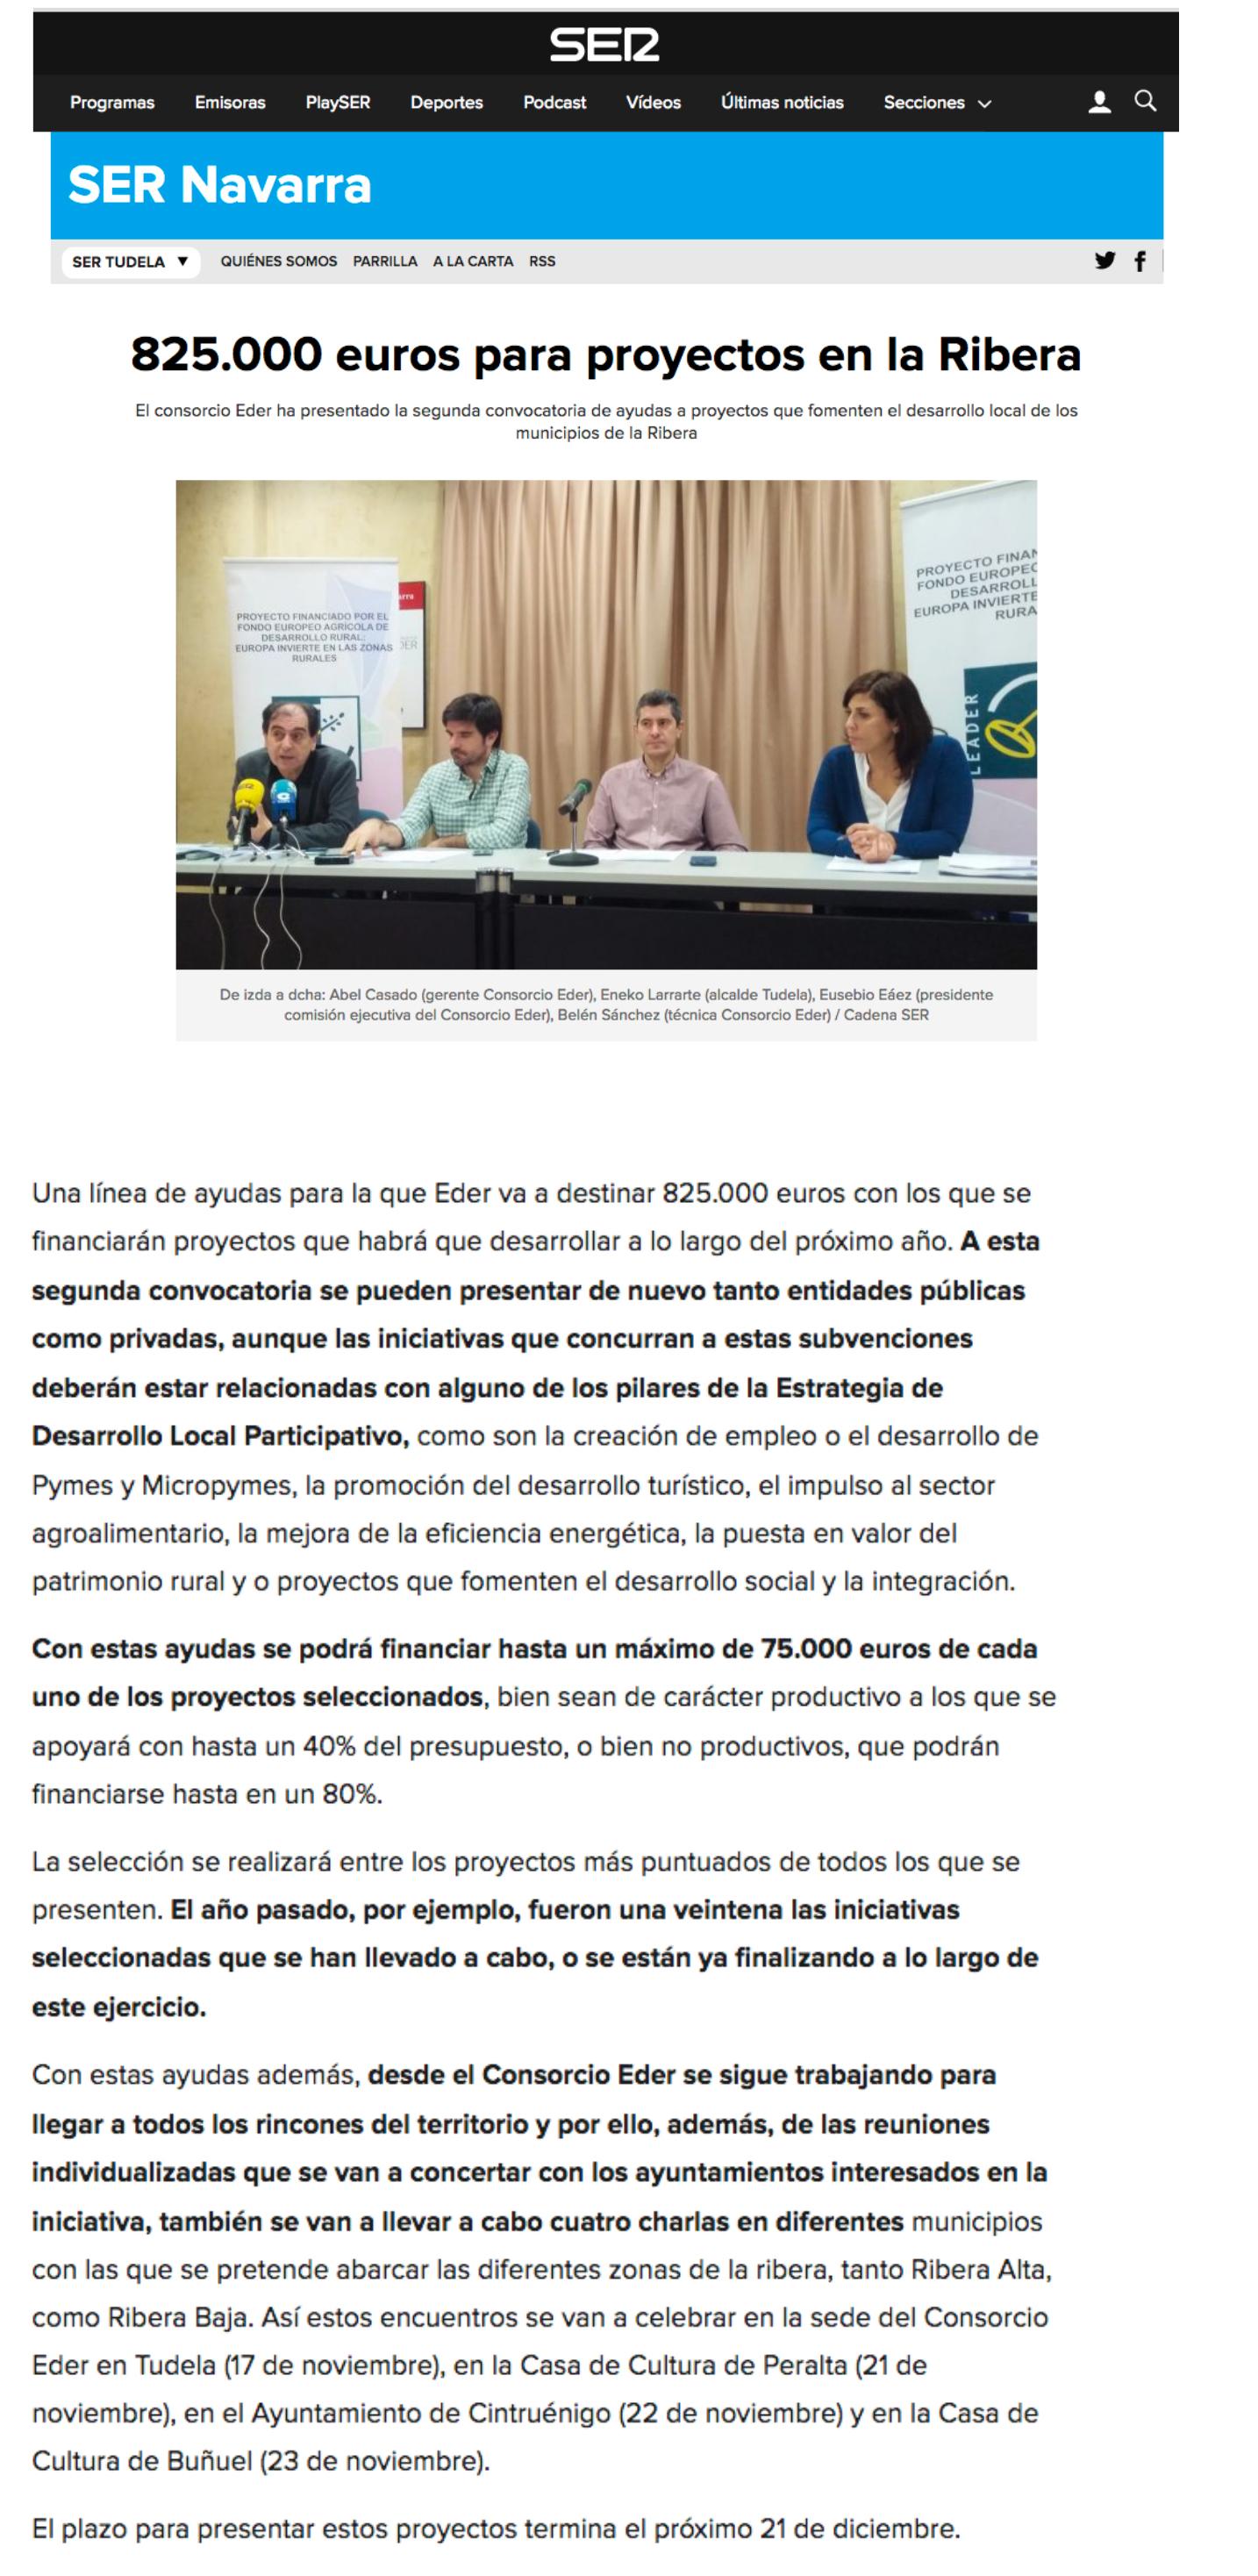 Moderno Reanudar Asistente Ejecutivo A Cfo Viñeta - Ejemplo De ...